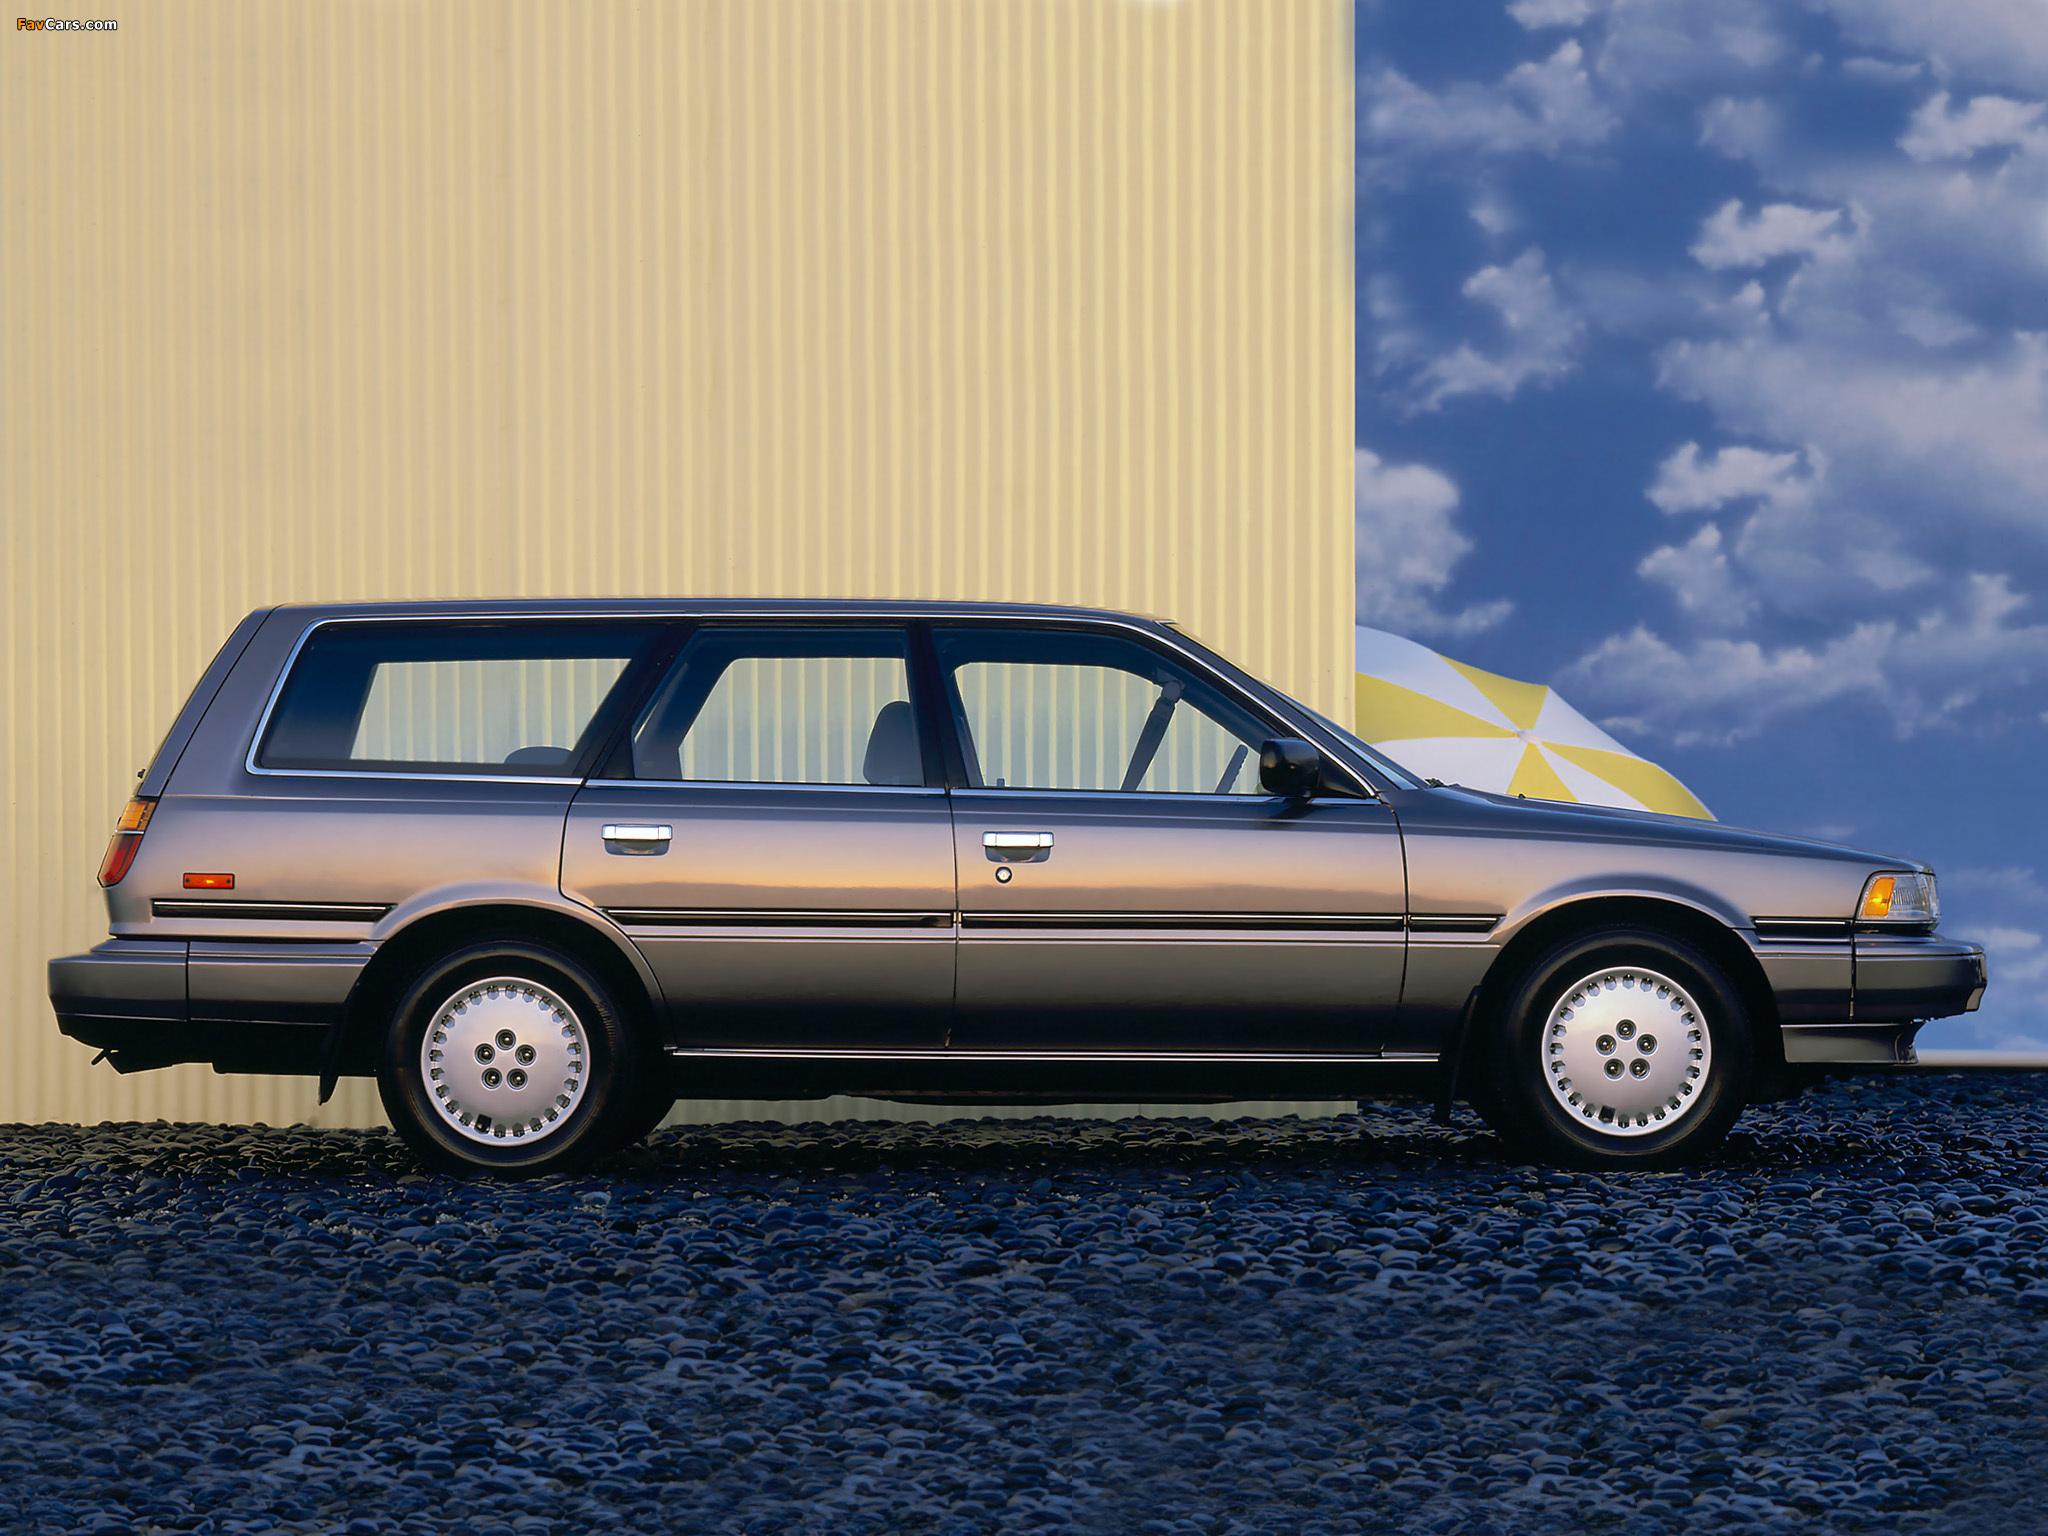 Toyota Camry Wagon V20 1986 91 Photos 2048x1536